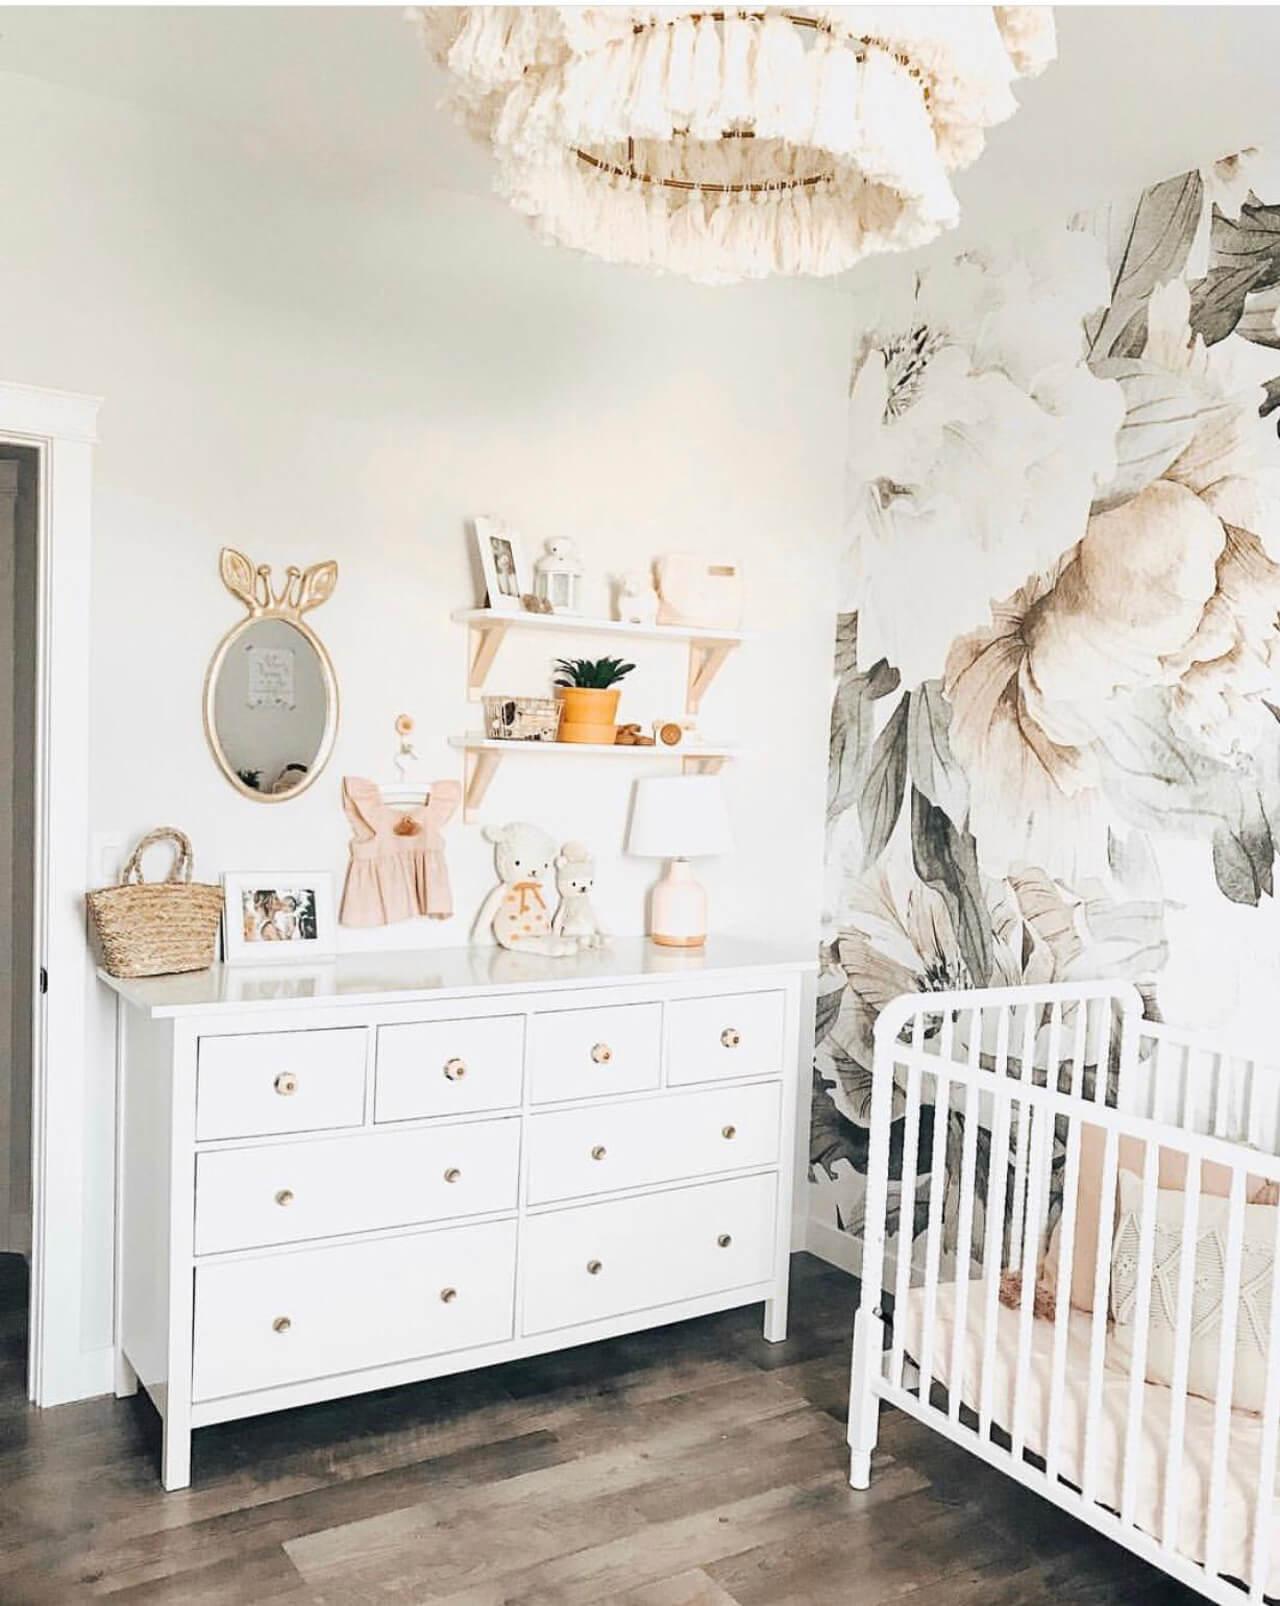 Baby Girl Nursery Decor Pretty baby girl nursery decor! - M Loves M @marmar